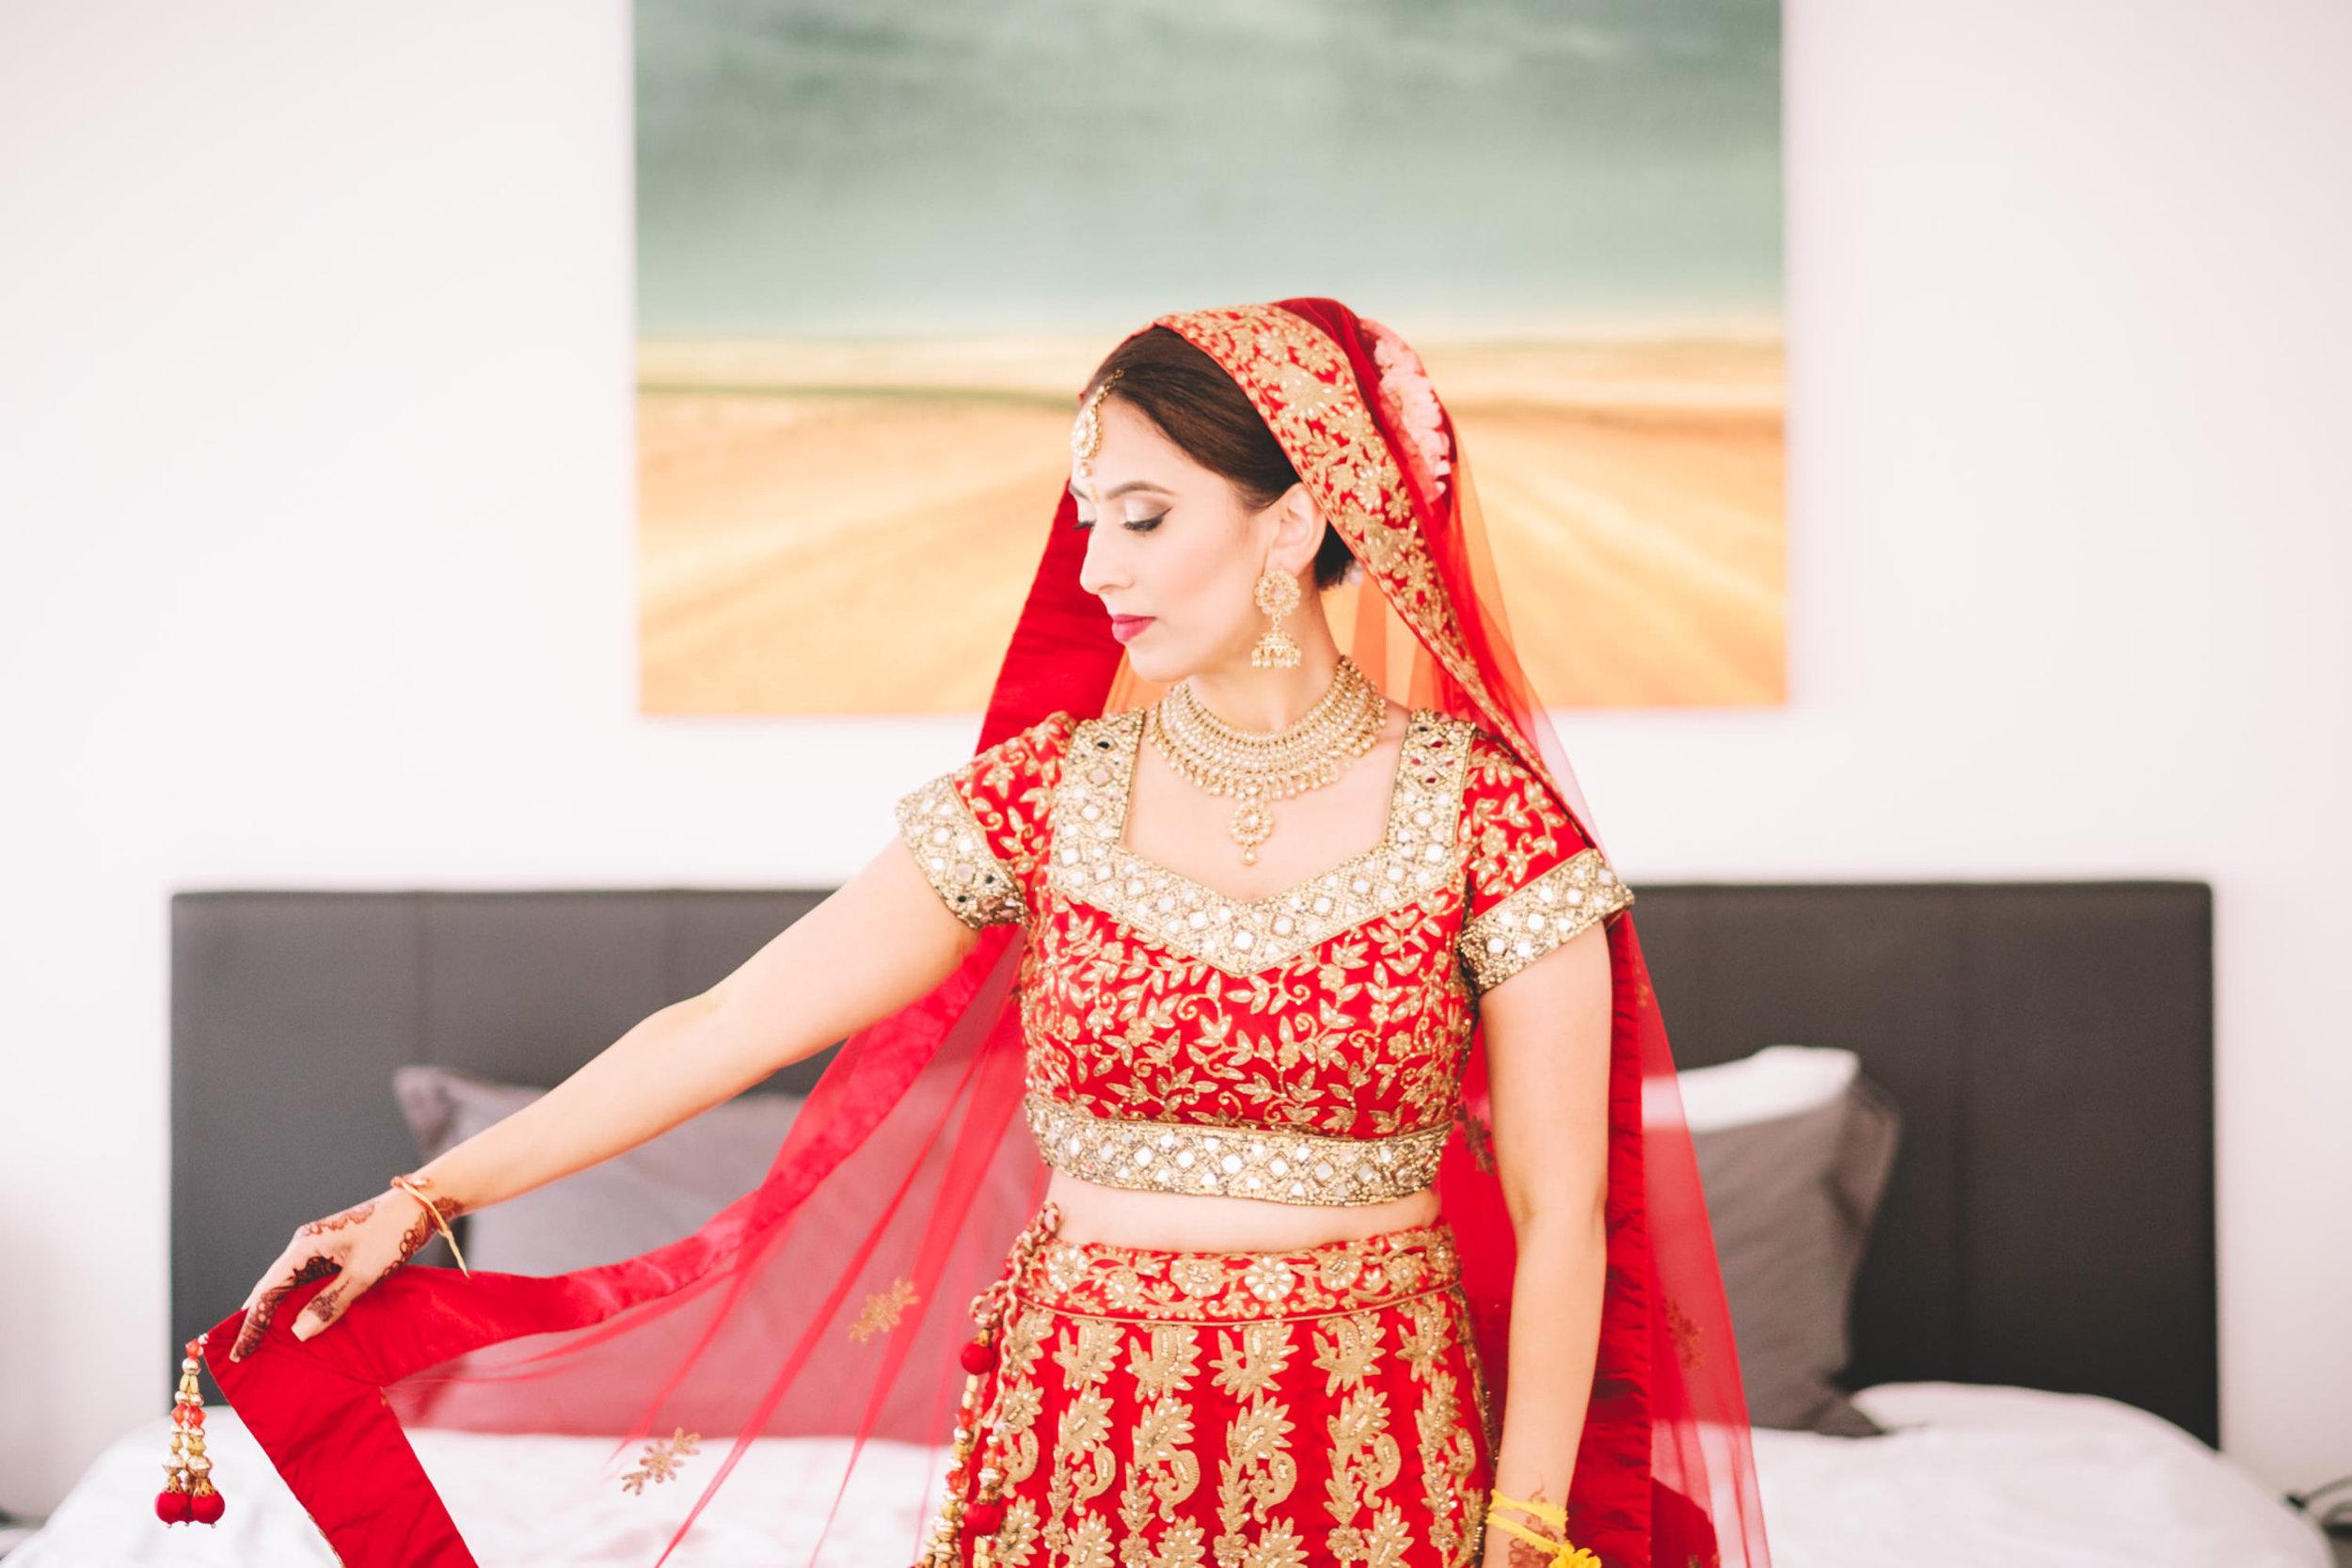 Umhlanga Wedding Photography Makeup Getting Ready